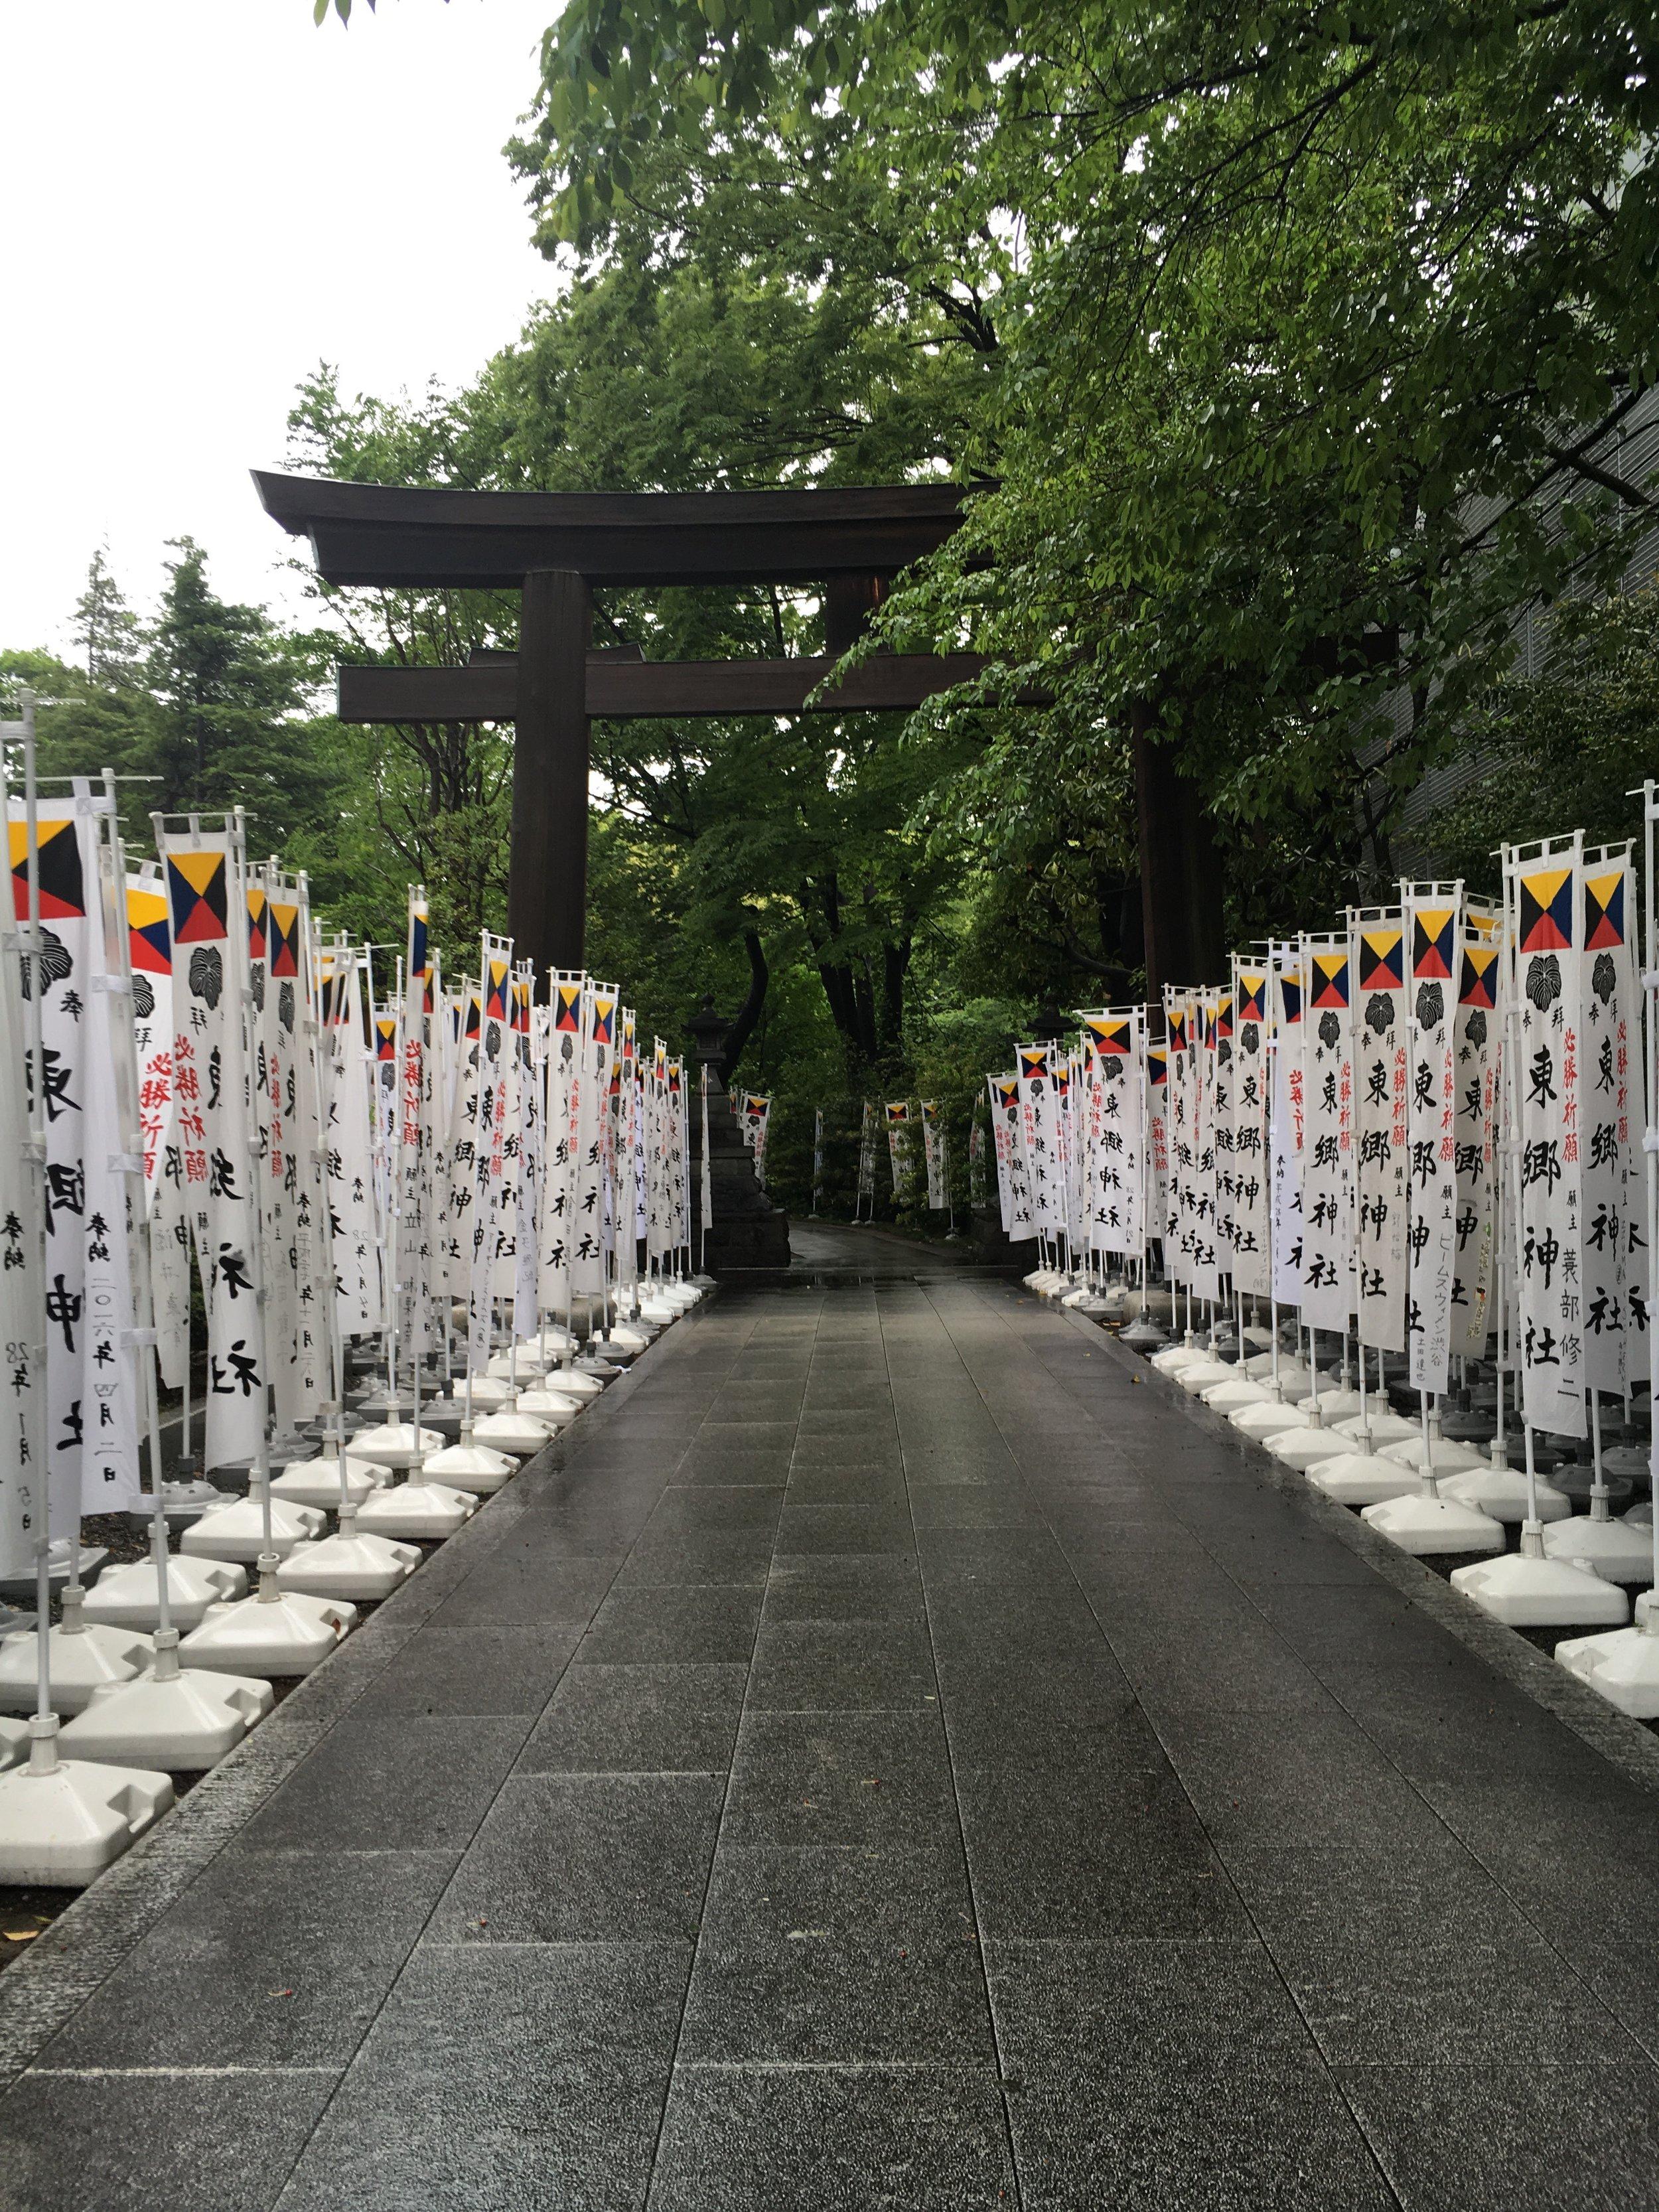 Beautifully aligned under the torii.